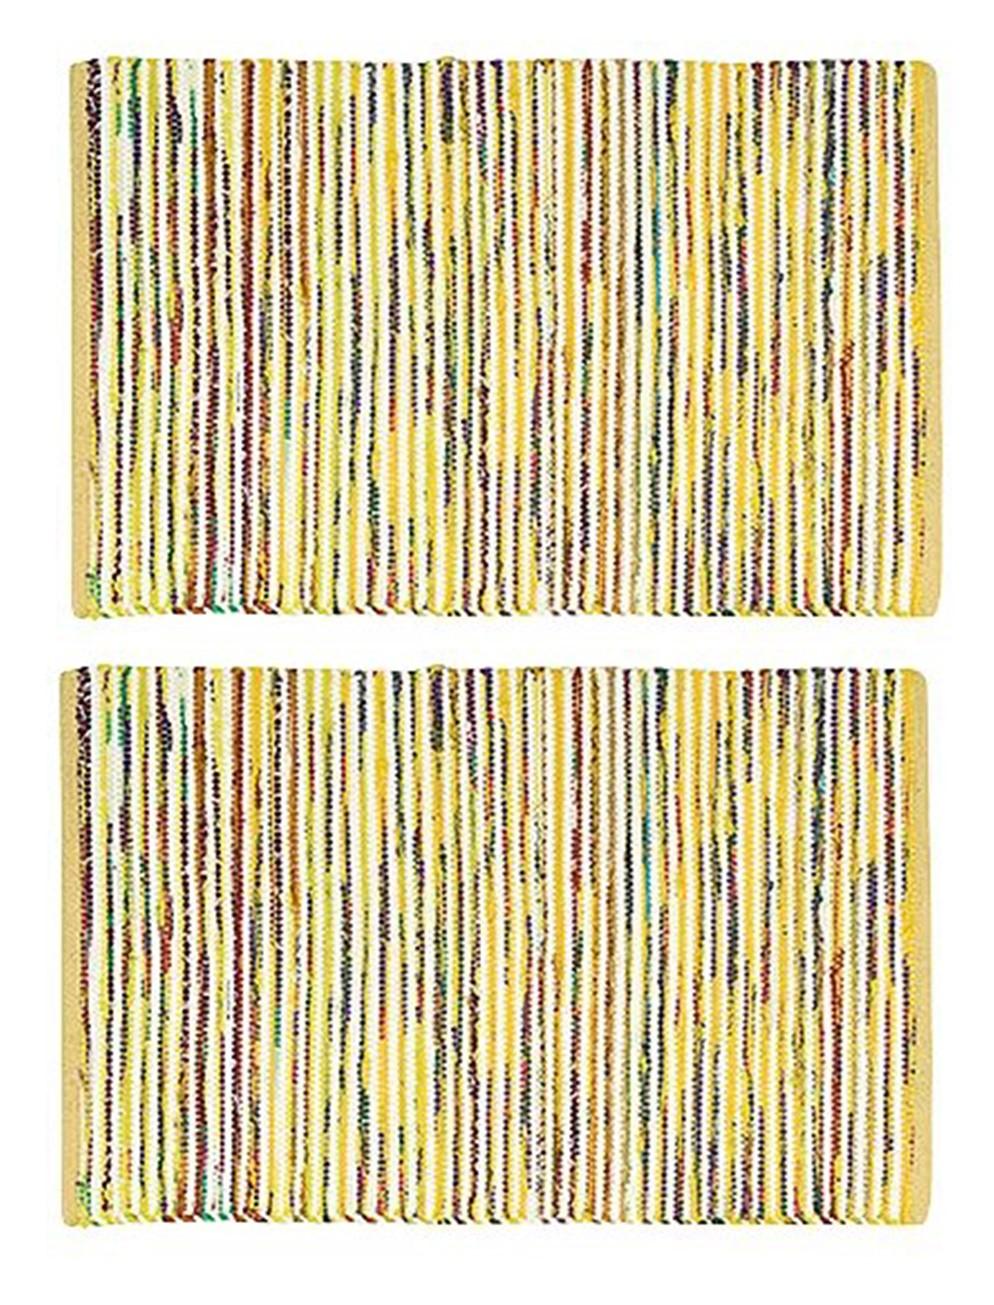 2-PACK-Nourison-Montclair-Stripe-Accent-Floor-Area-Rugs-24-034-x-36-034-or-30-034-x-48-034 thumbnail 3